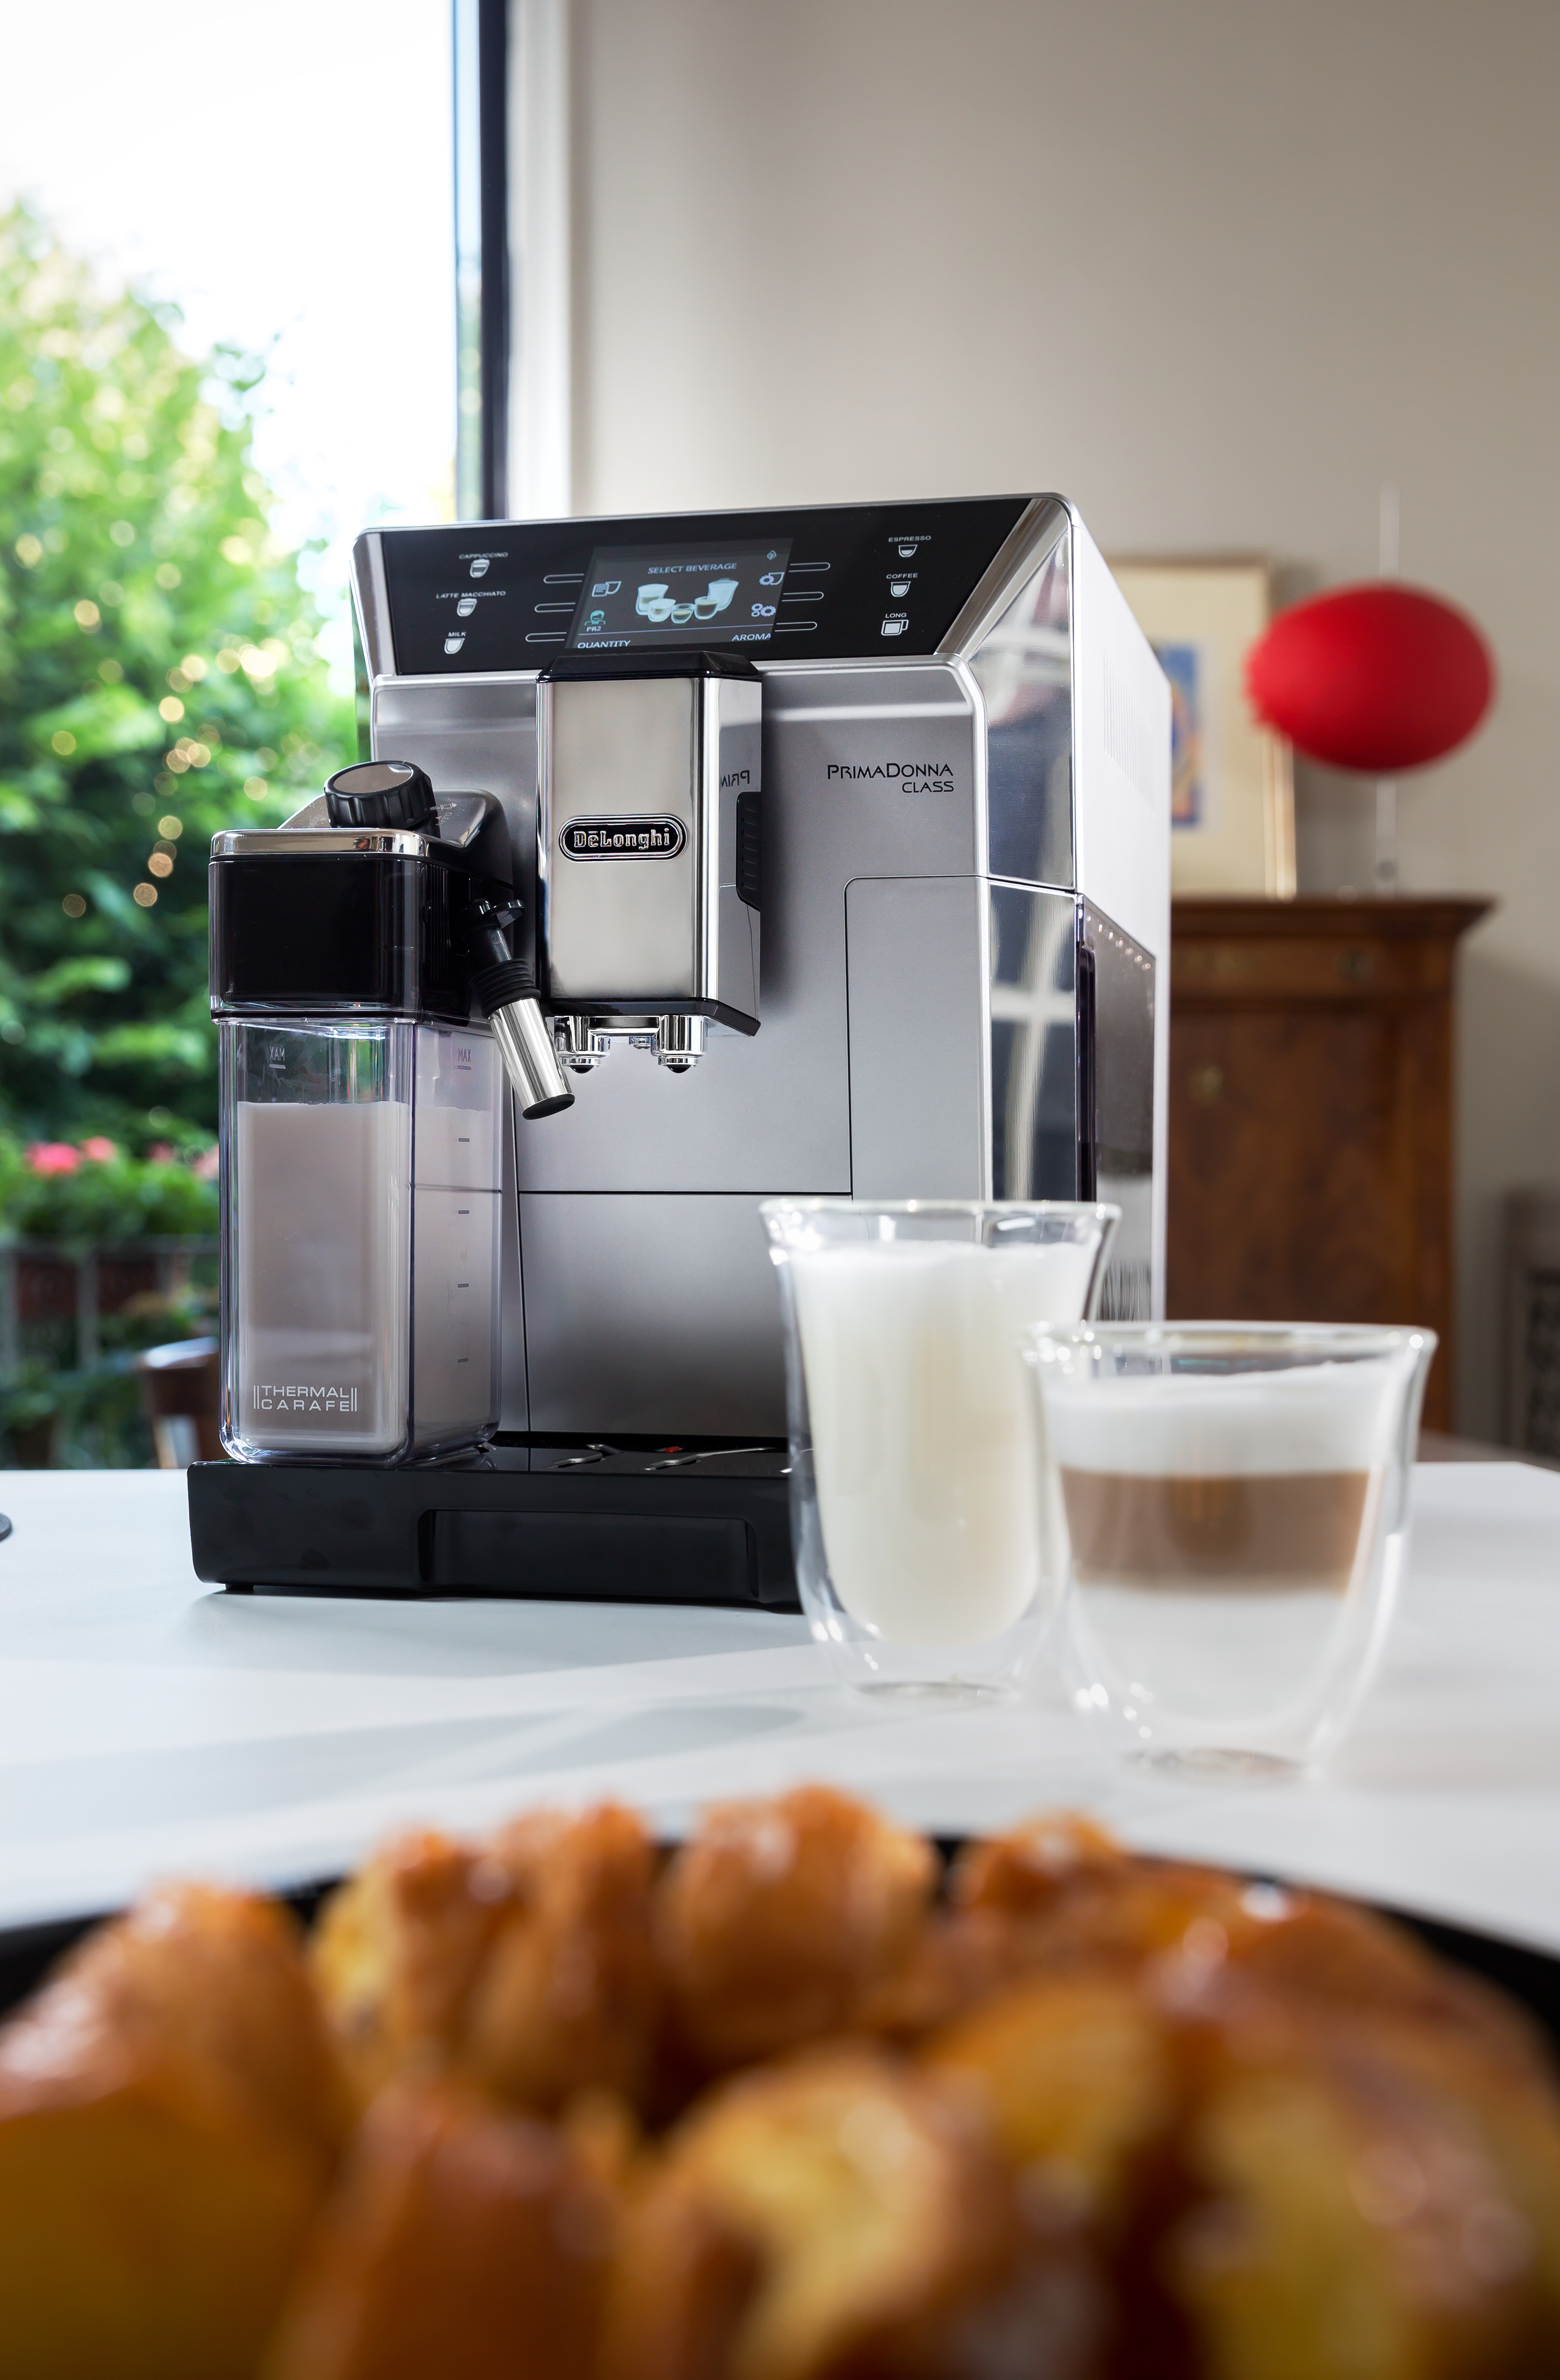 Кофеварка / кофемашина DeLonghi Primadonna Class ECAM 550.75.MS